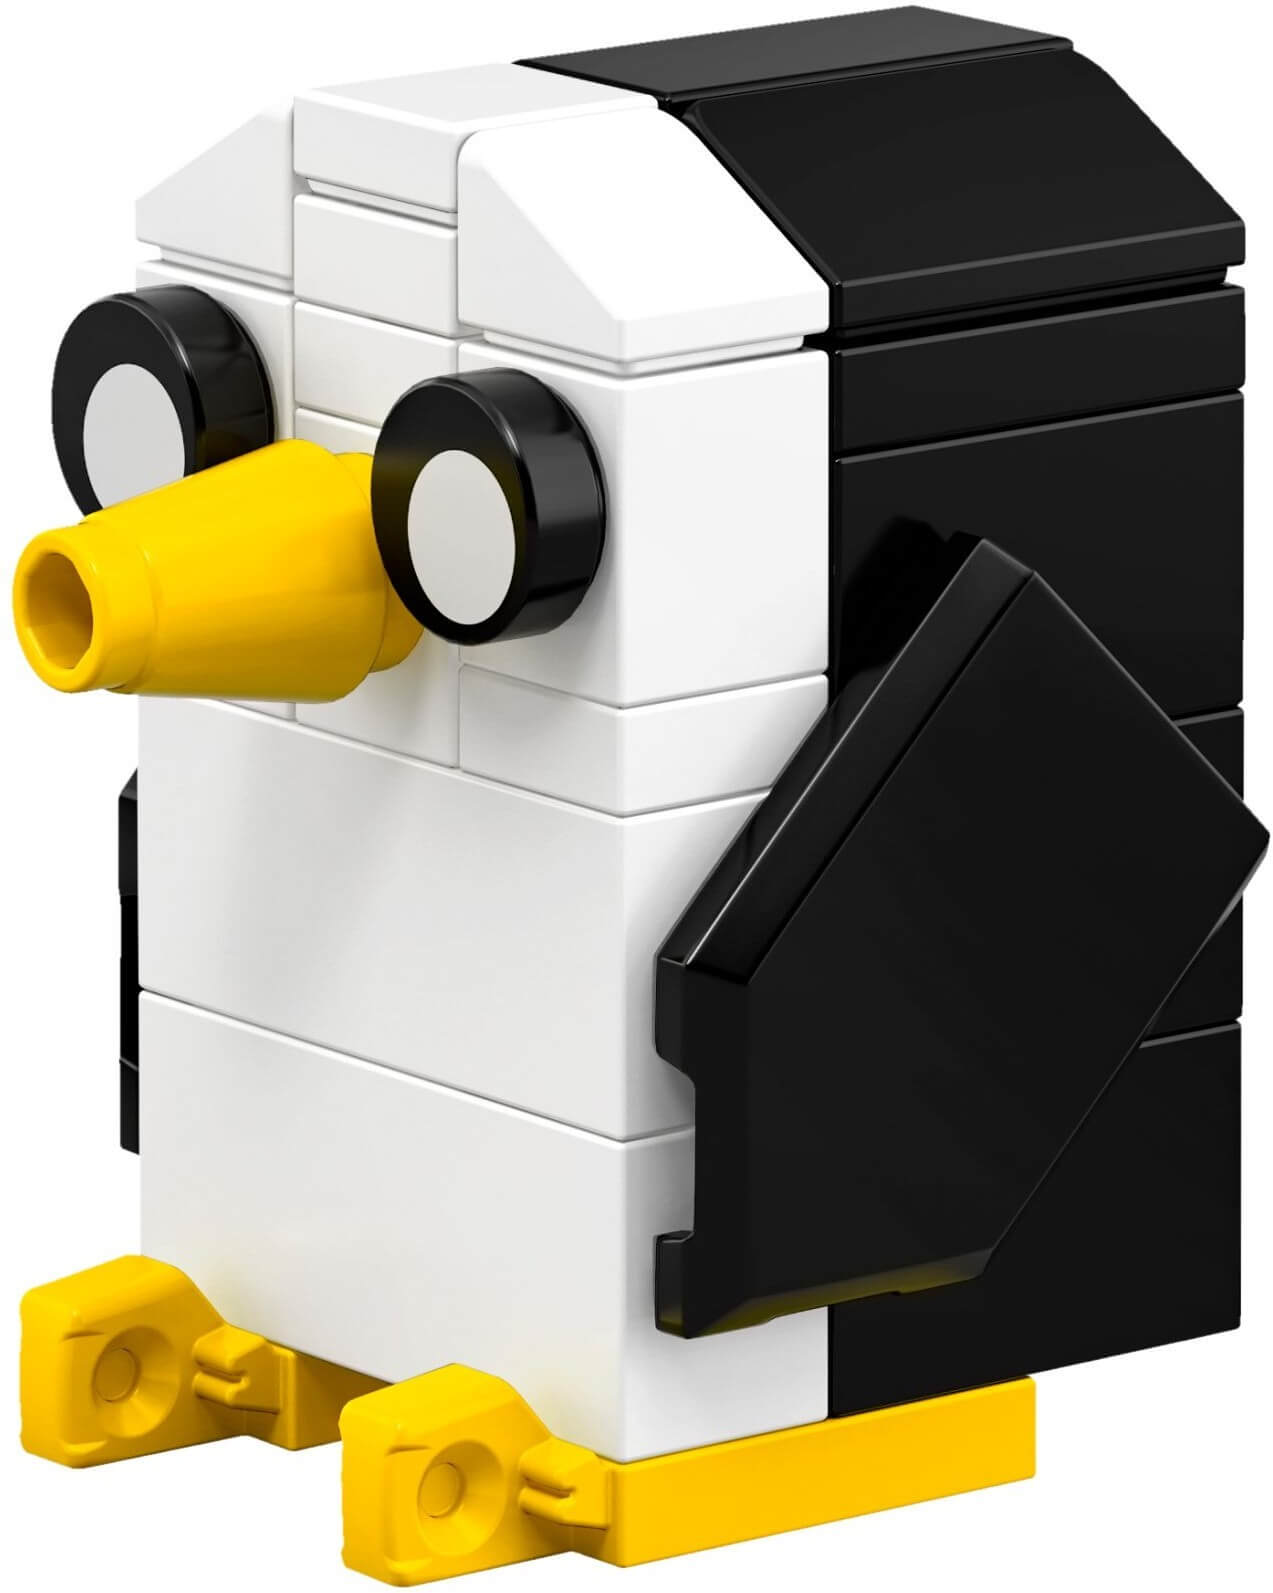 Mua đồ chơi LEGO 21308 - LEGO Ideas 21308 - Cuộc Phiêu Lưu Của Finn và Jake (LEGO 21308 Adventure Time)